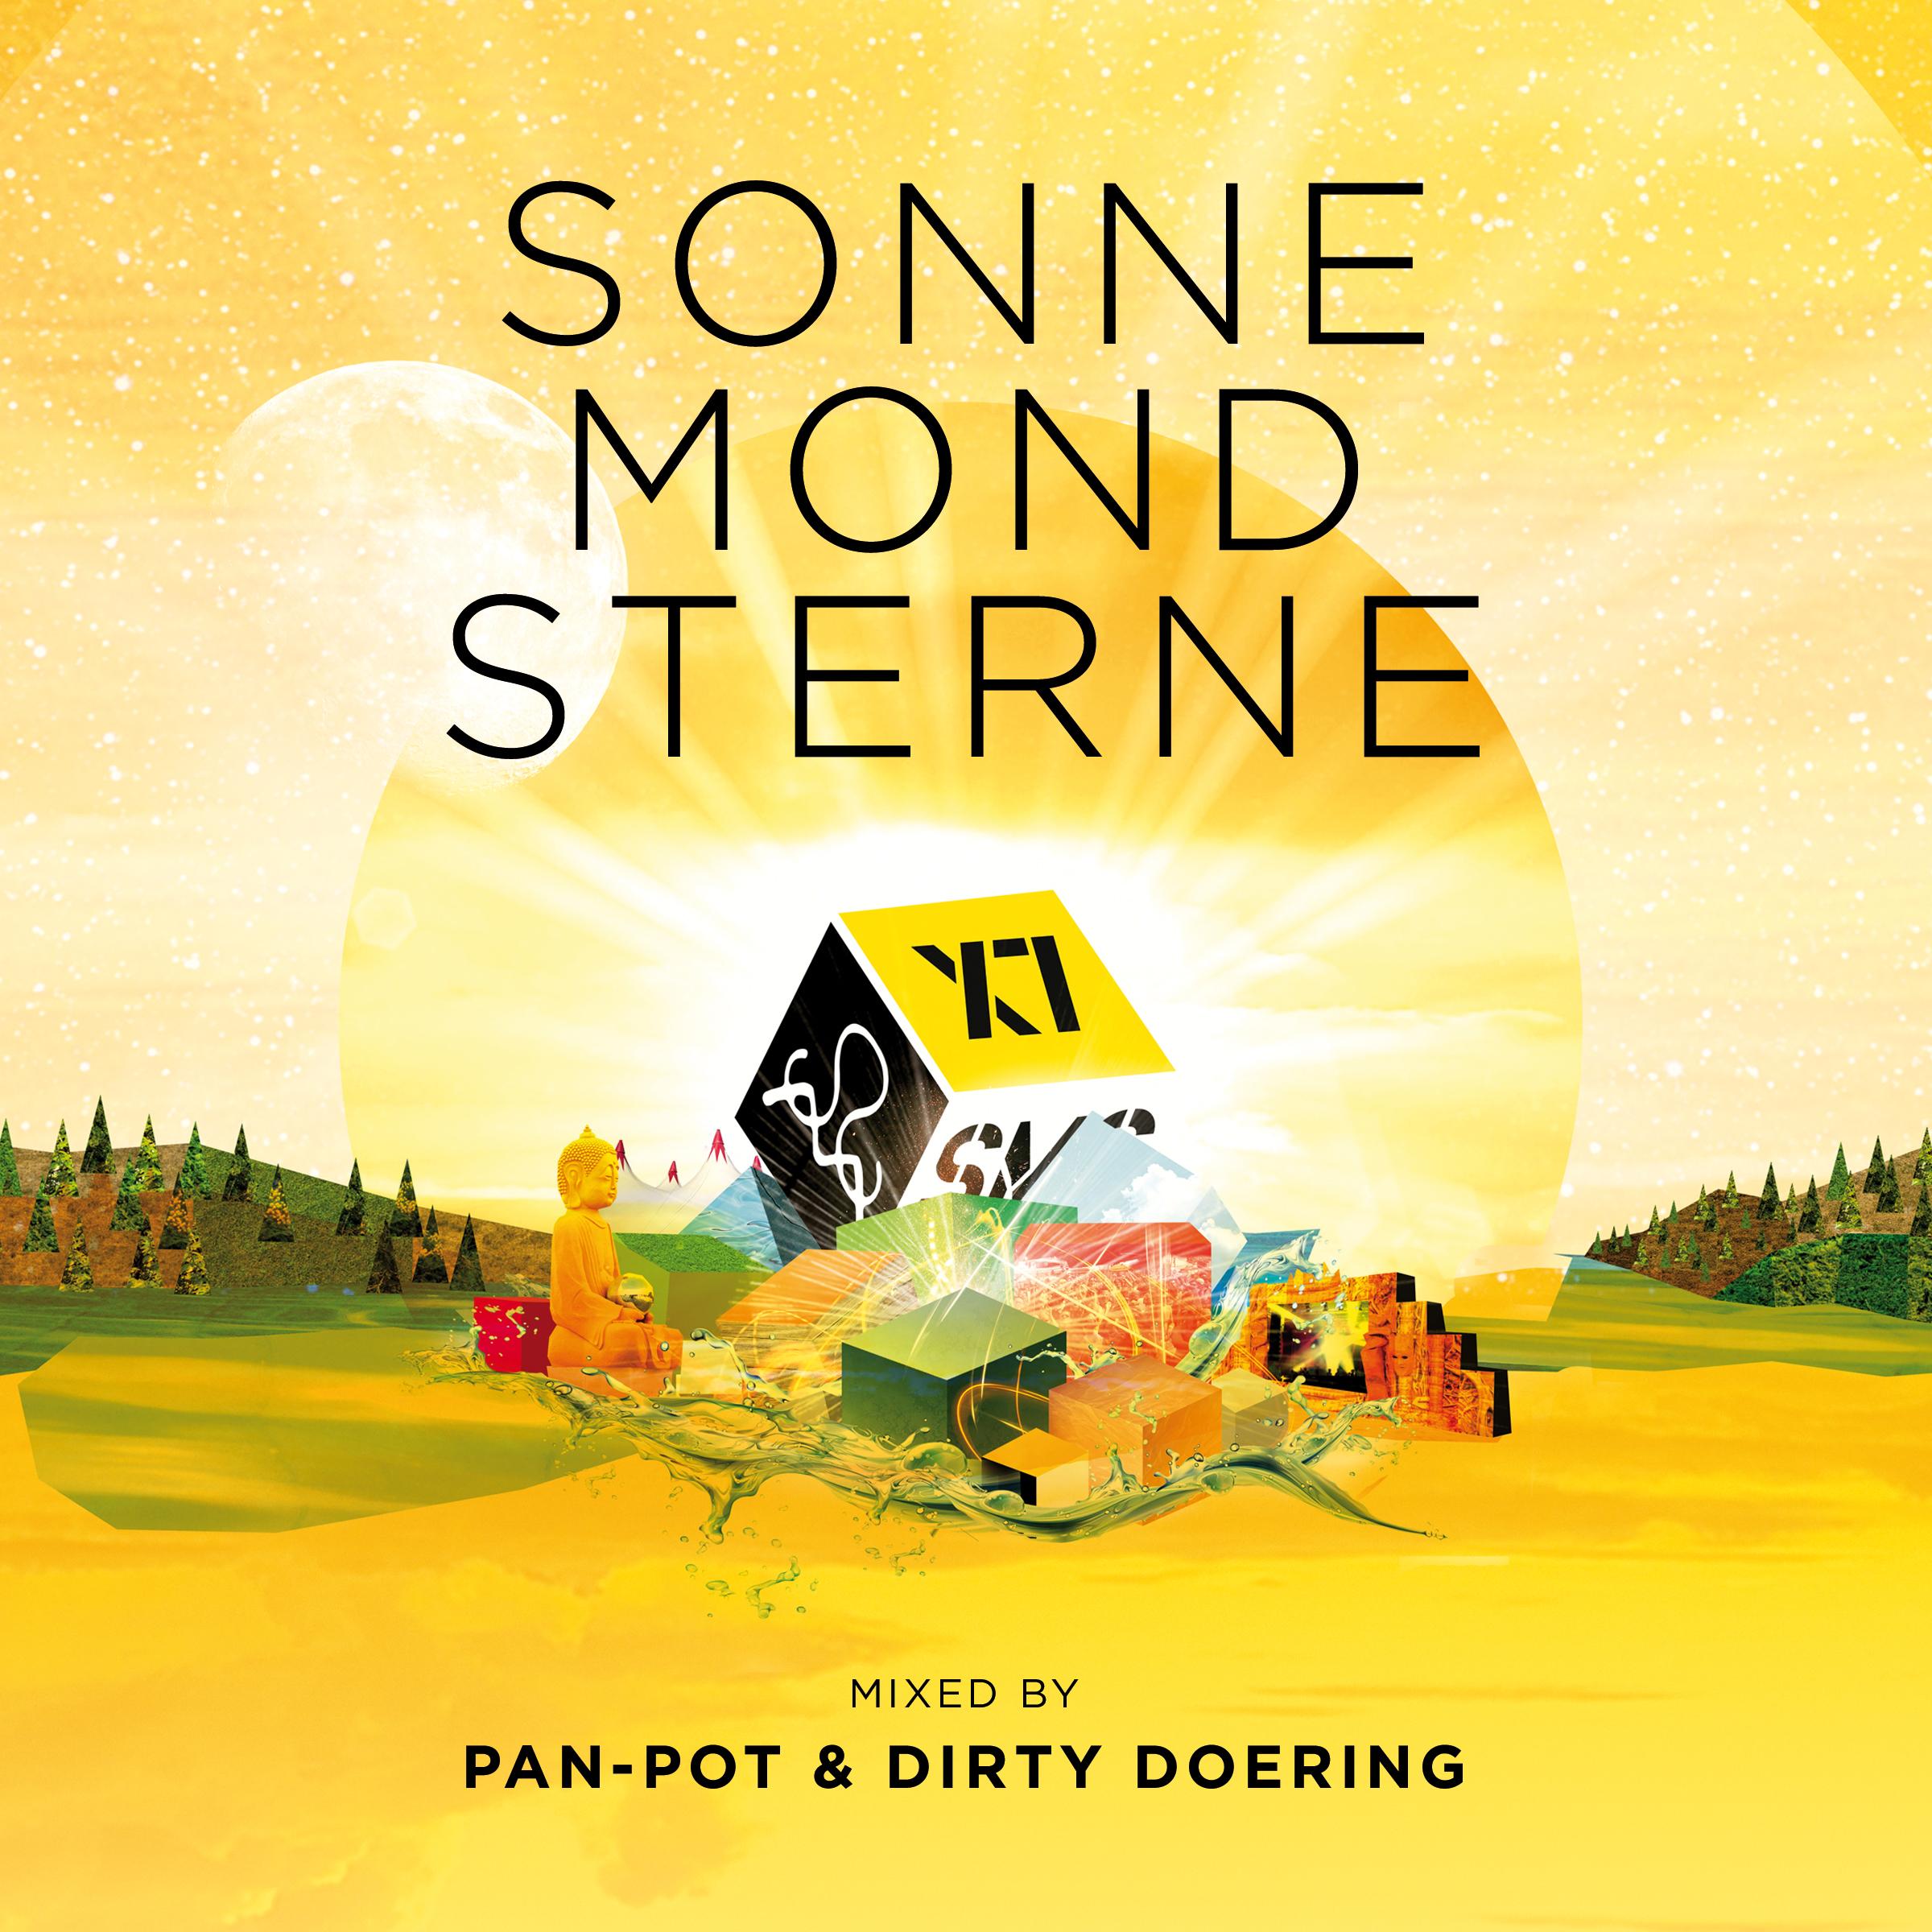 Pan-Pot & Dirty Doering mixen die neue SonneMondSterne-Compilation